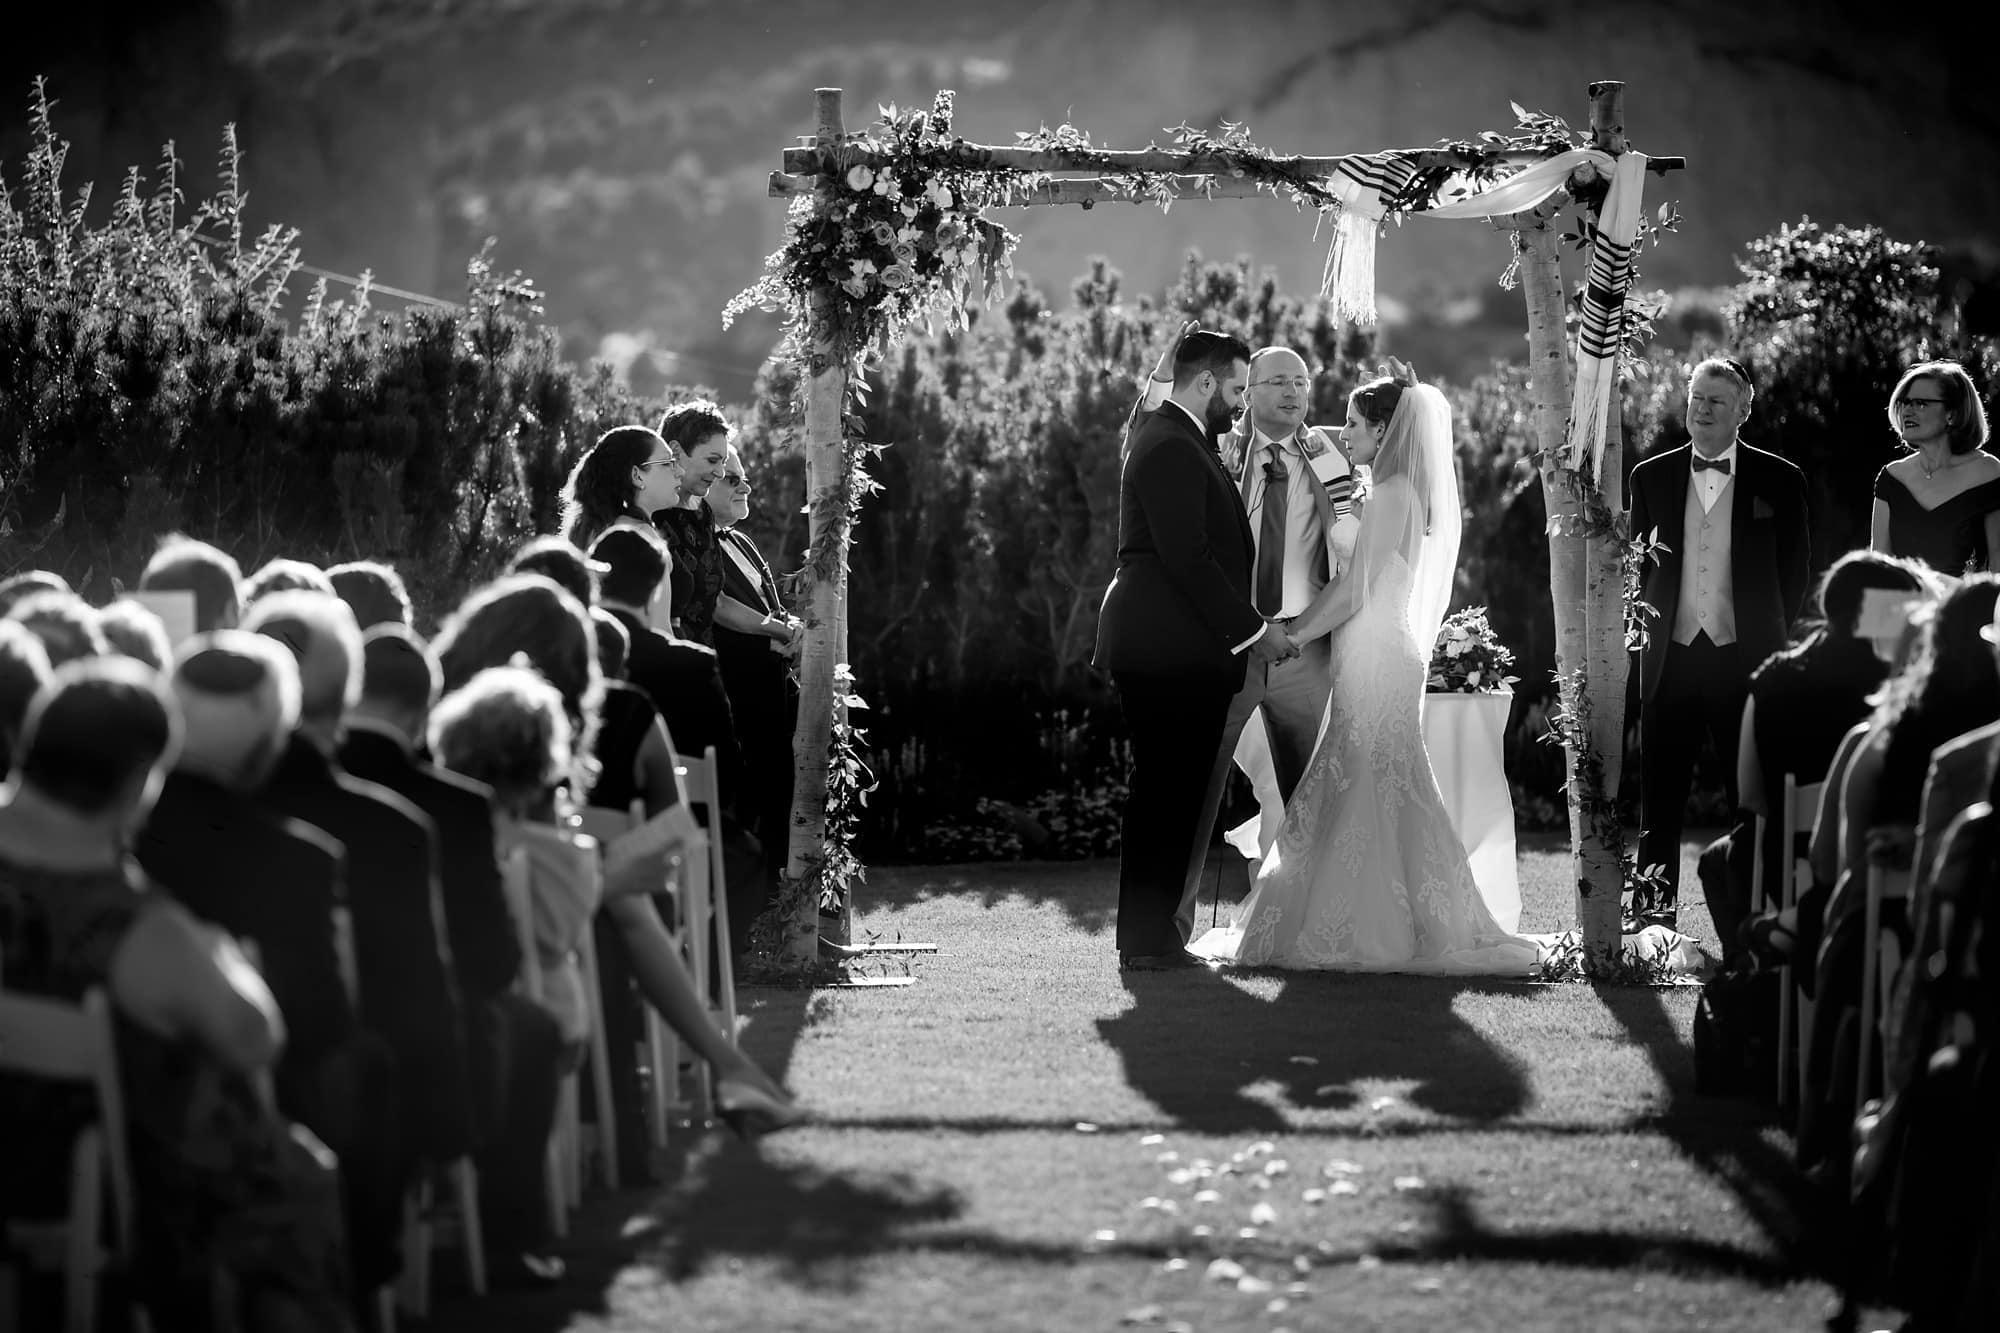 The rabbi prays during the jewish wedding ceremony at Garden of the Gods Club